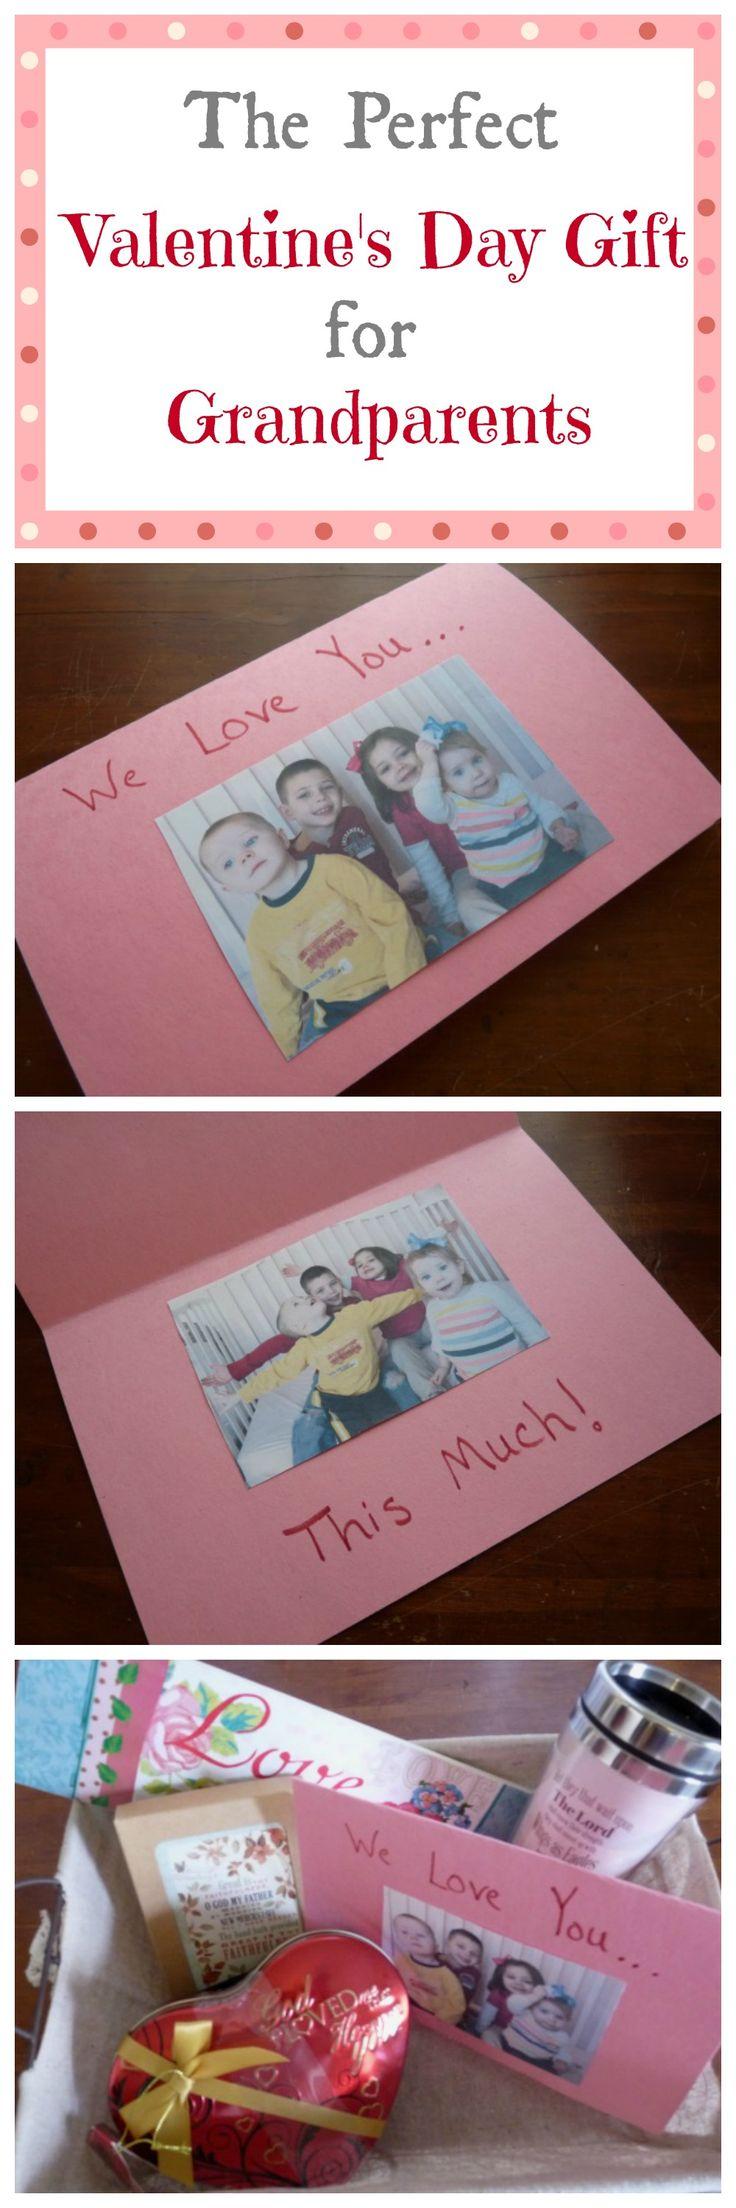 Valentine's Day Gift for Grandparents